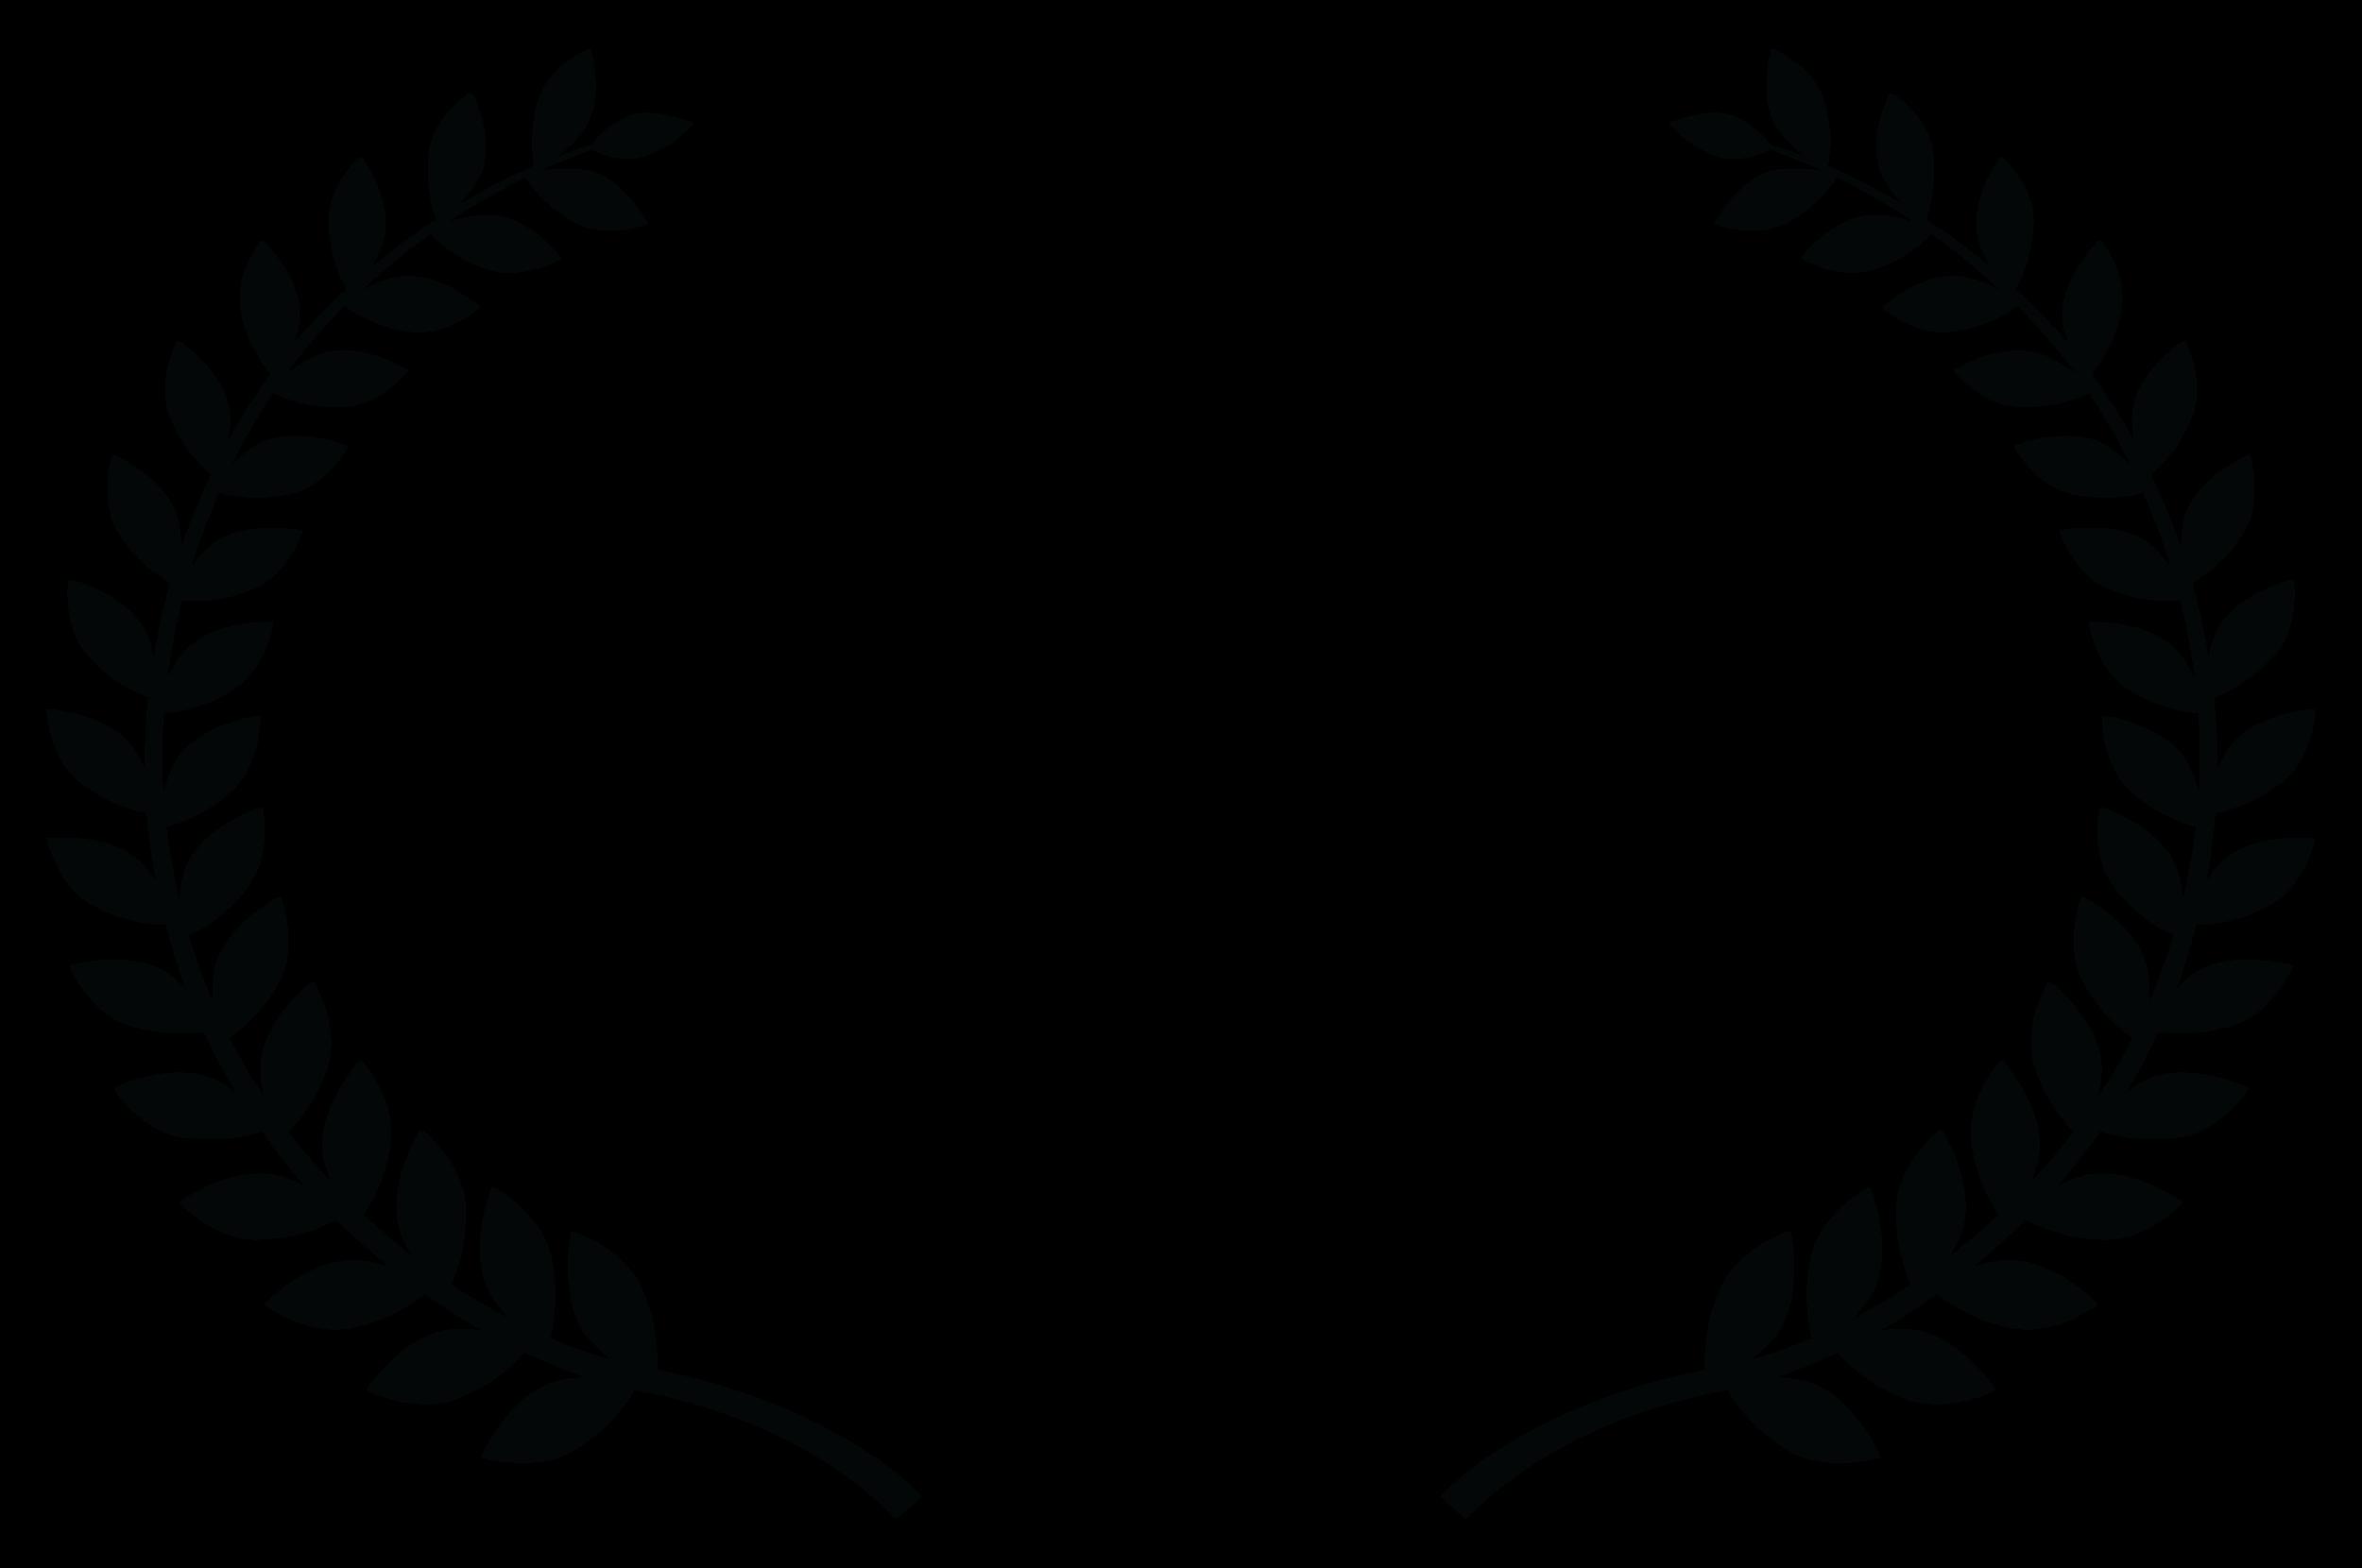 OFFICIALSELECTION-DurhamRegionFilmFestival-2016.png